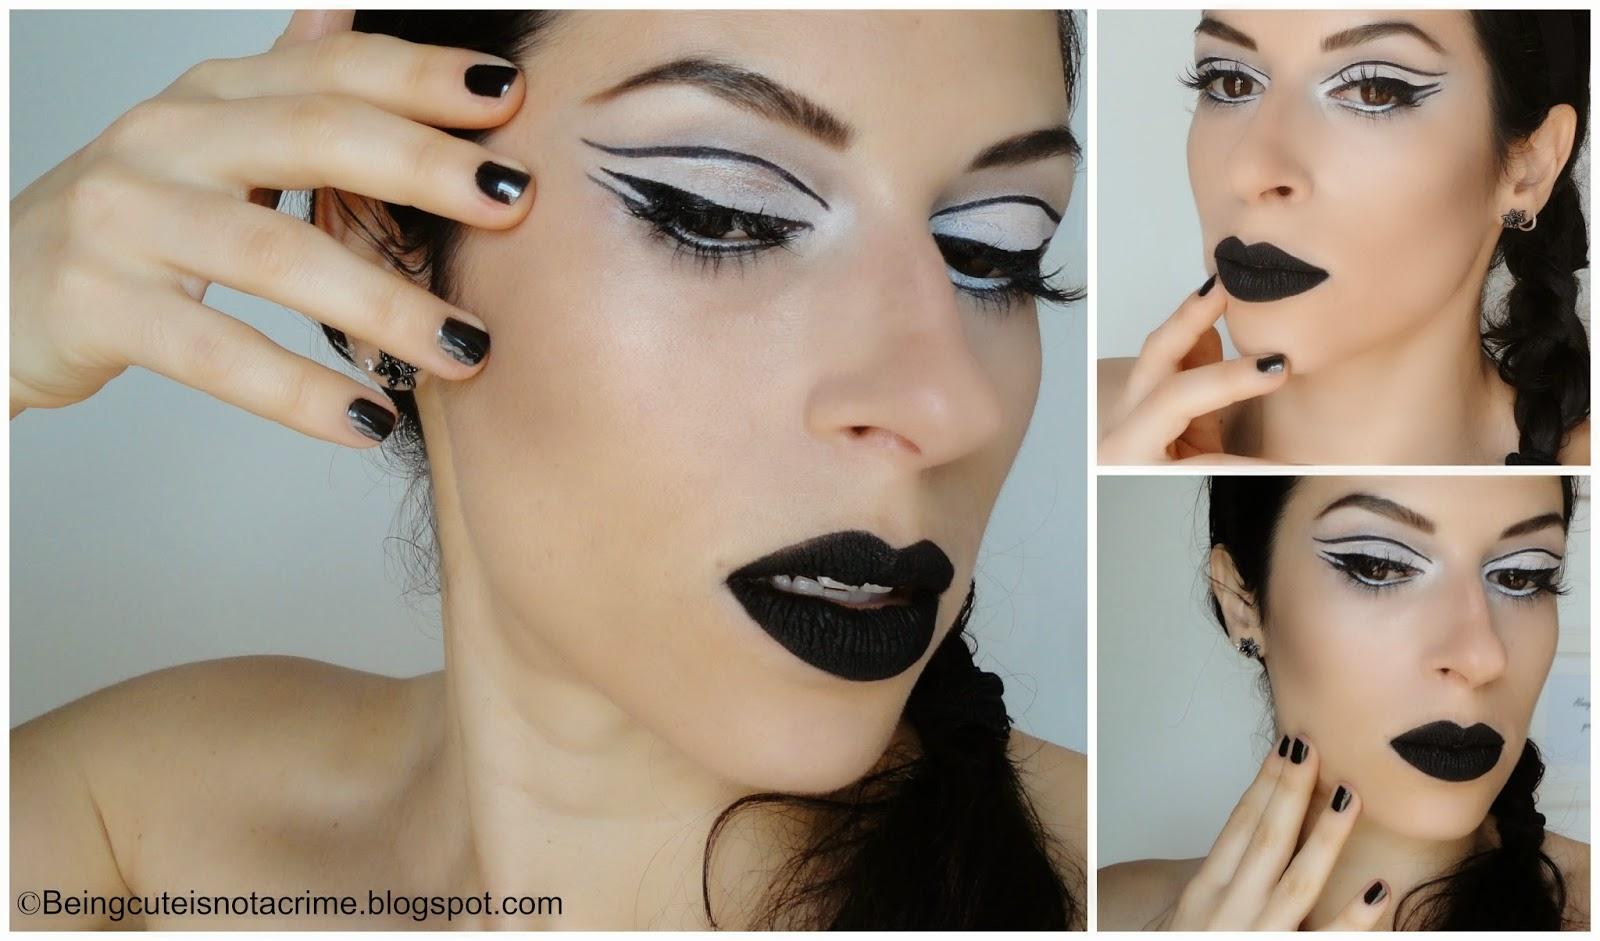 http://beingcuteisnotacrime.blogspot.nl/2014/07/make-up-serie-matchy-matchy-6-black.html